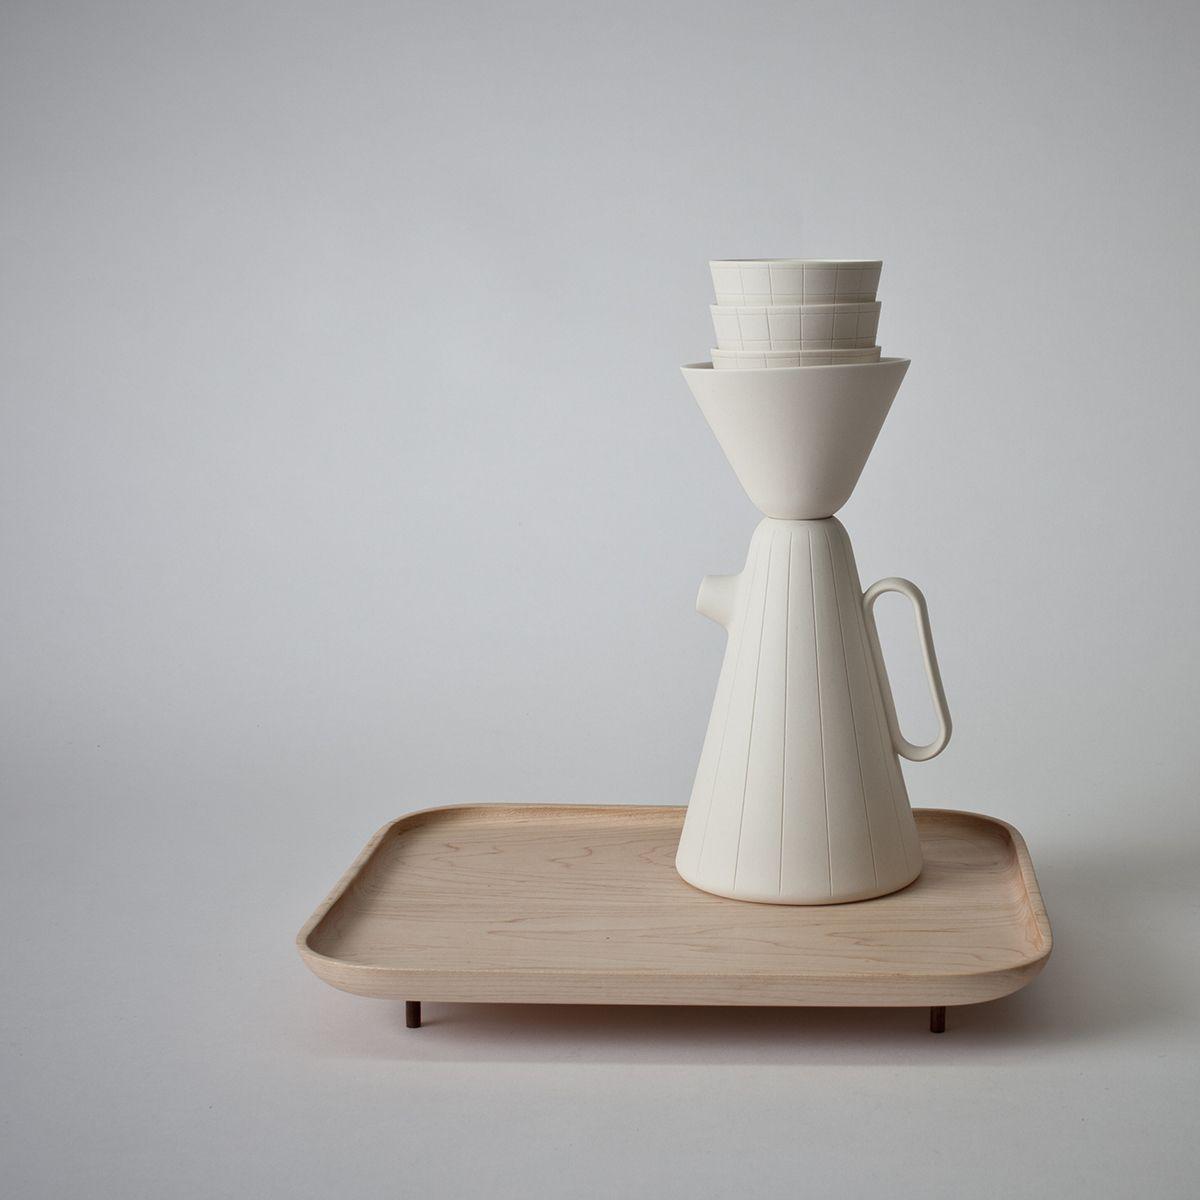 Sucabaruca coffee set by Luca Nichetto for Mjolk :08